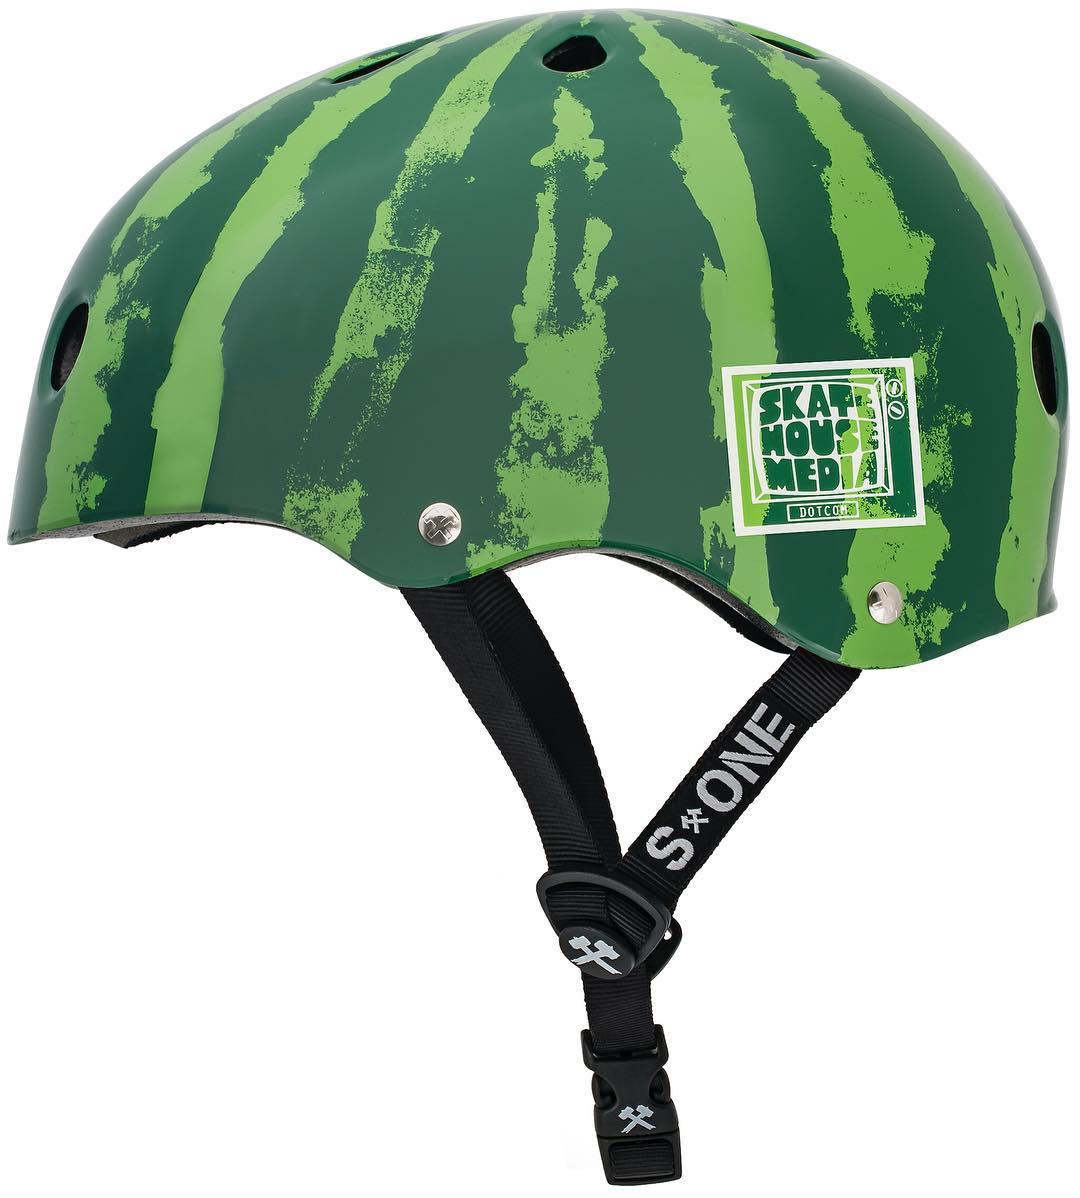 S1 X @skatehousemedia helmets in stock - #watermelonhelmet